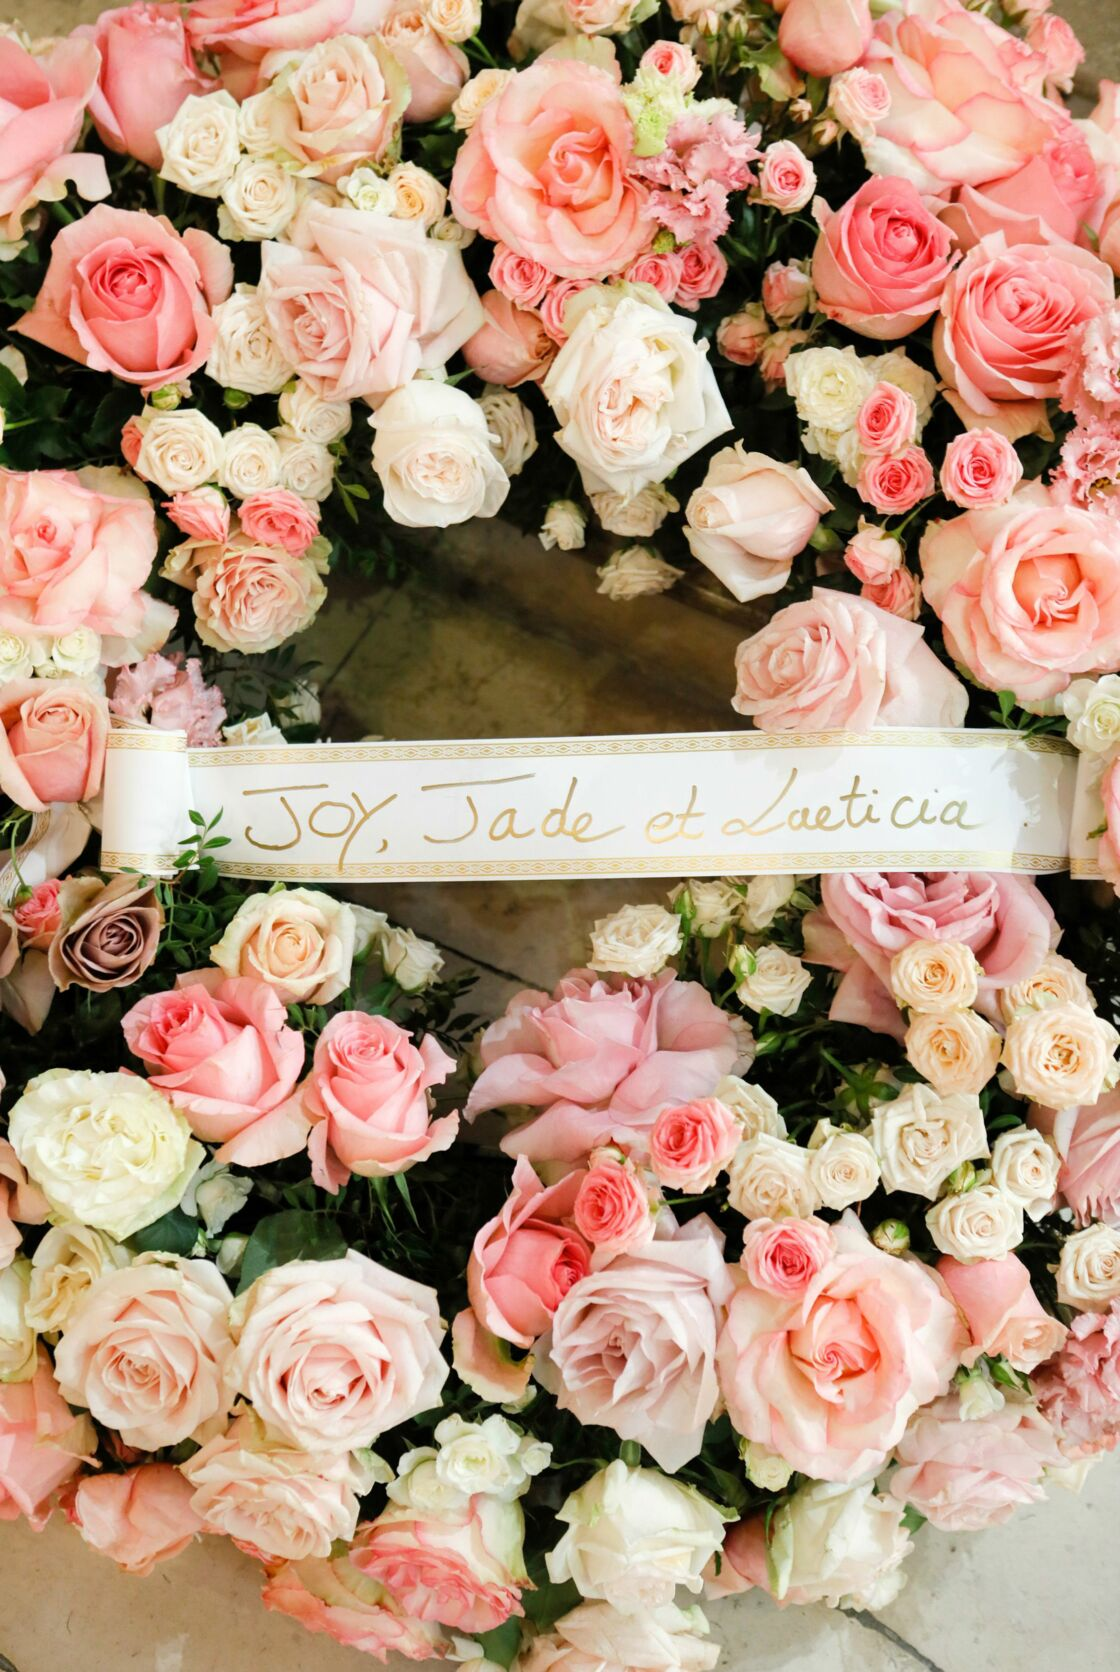 A l'église Saint-Thomas-d'Aquin, jeudi 14 novembre, une gerbe de roses signée par Laeticia, Jade et Joy Hallyday.